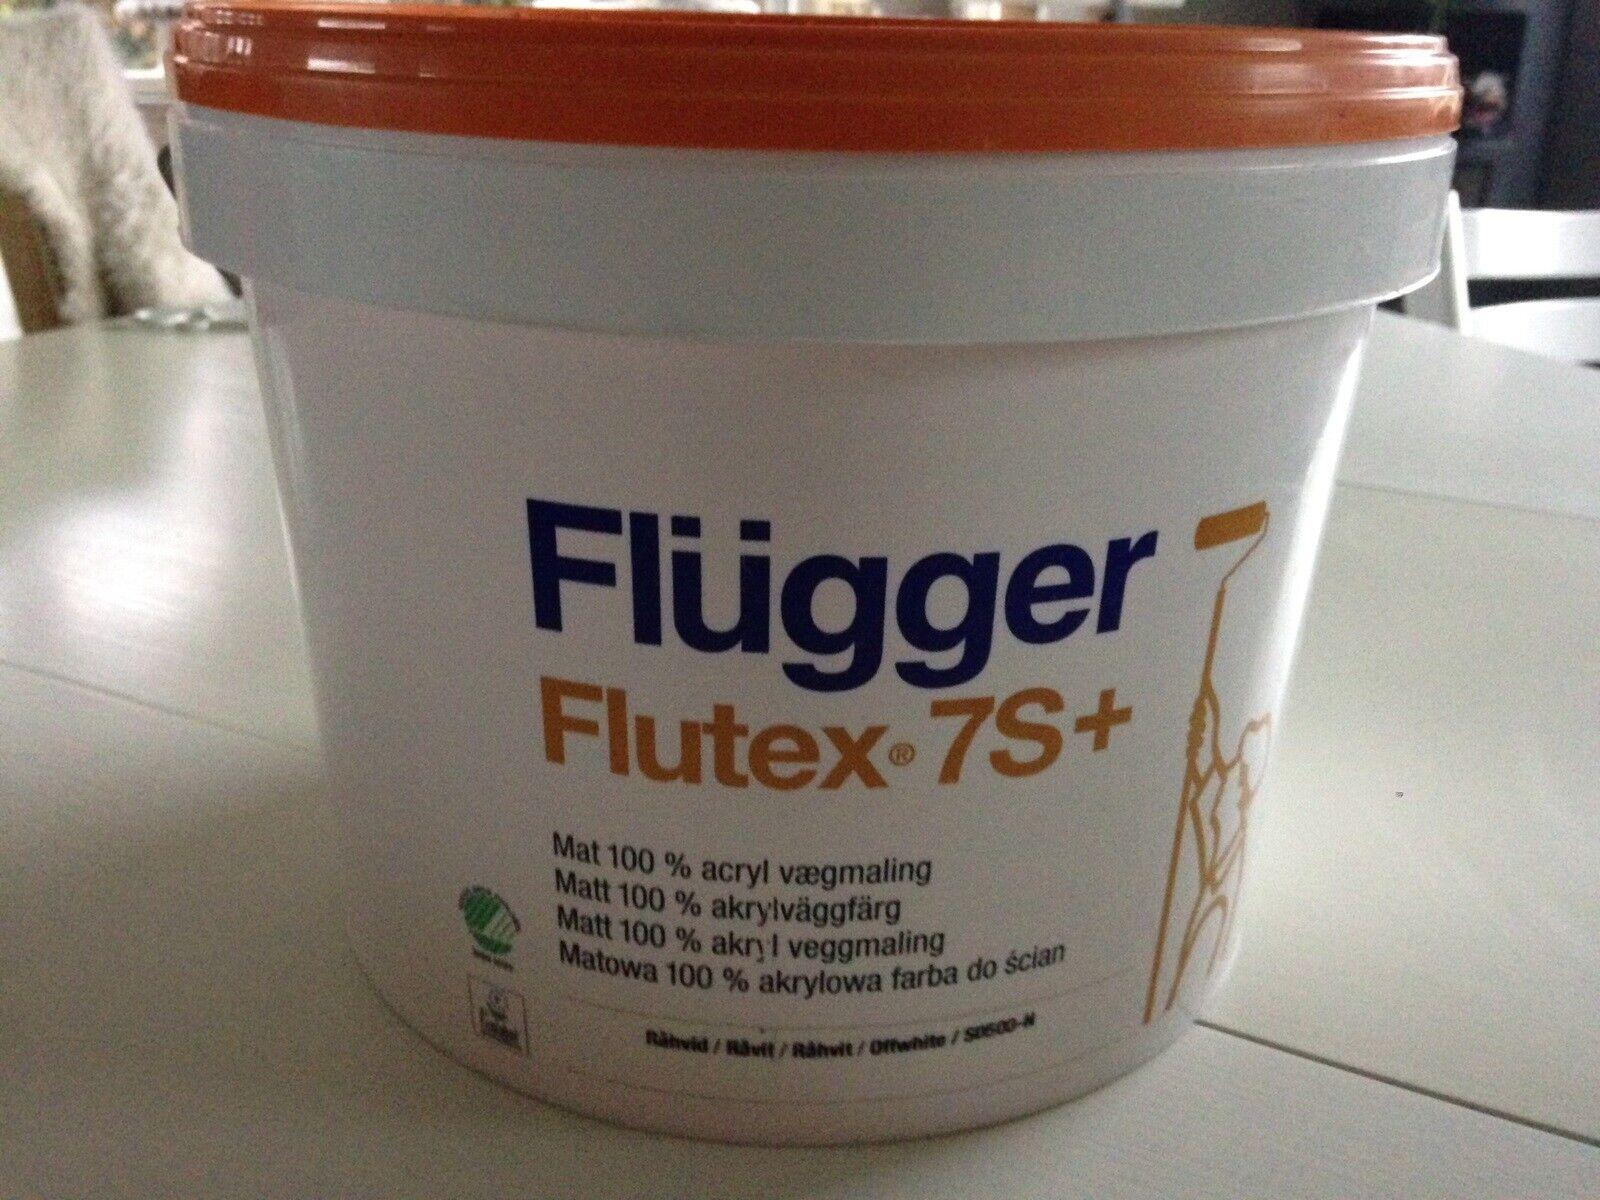 flugger flutex 7s pris